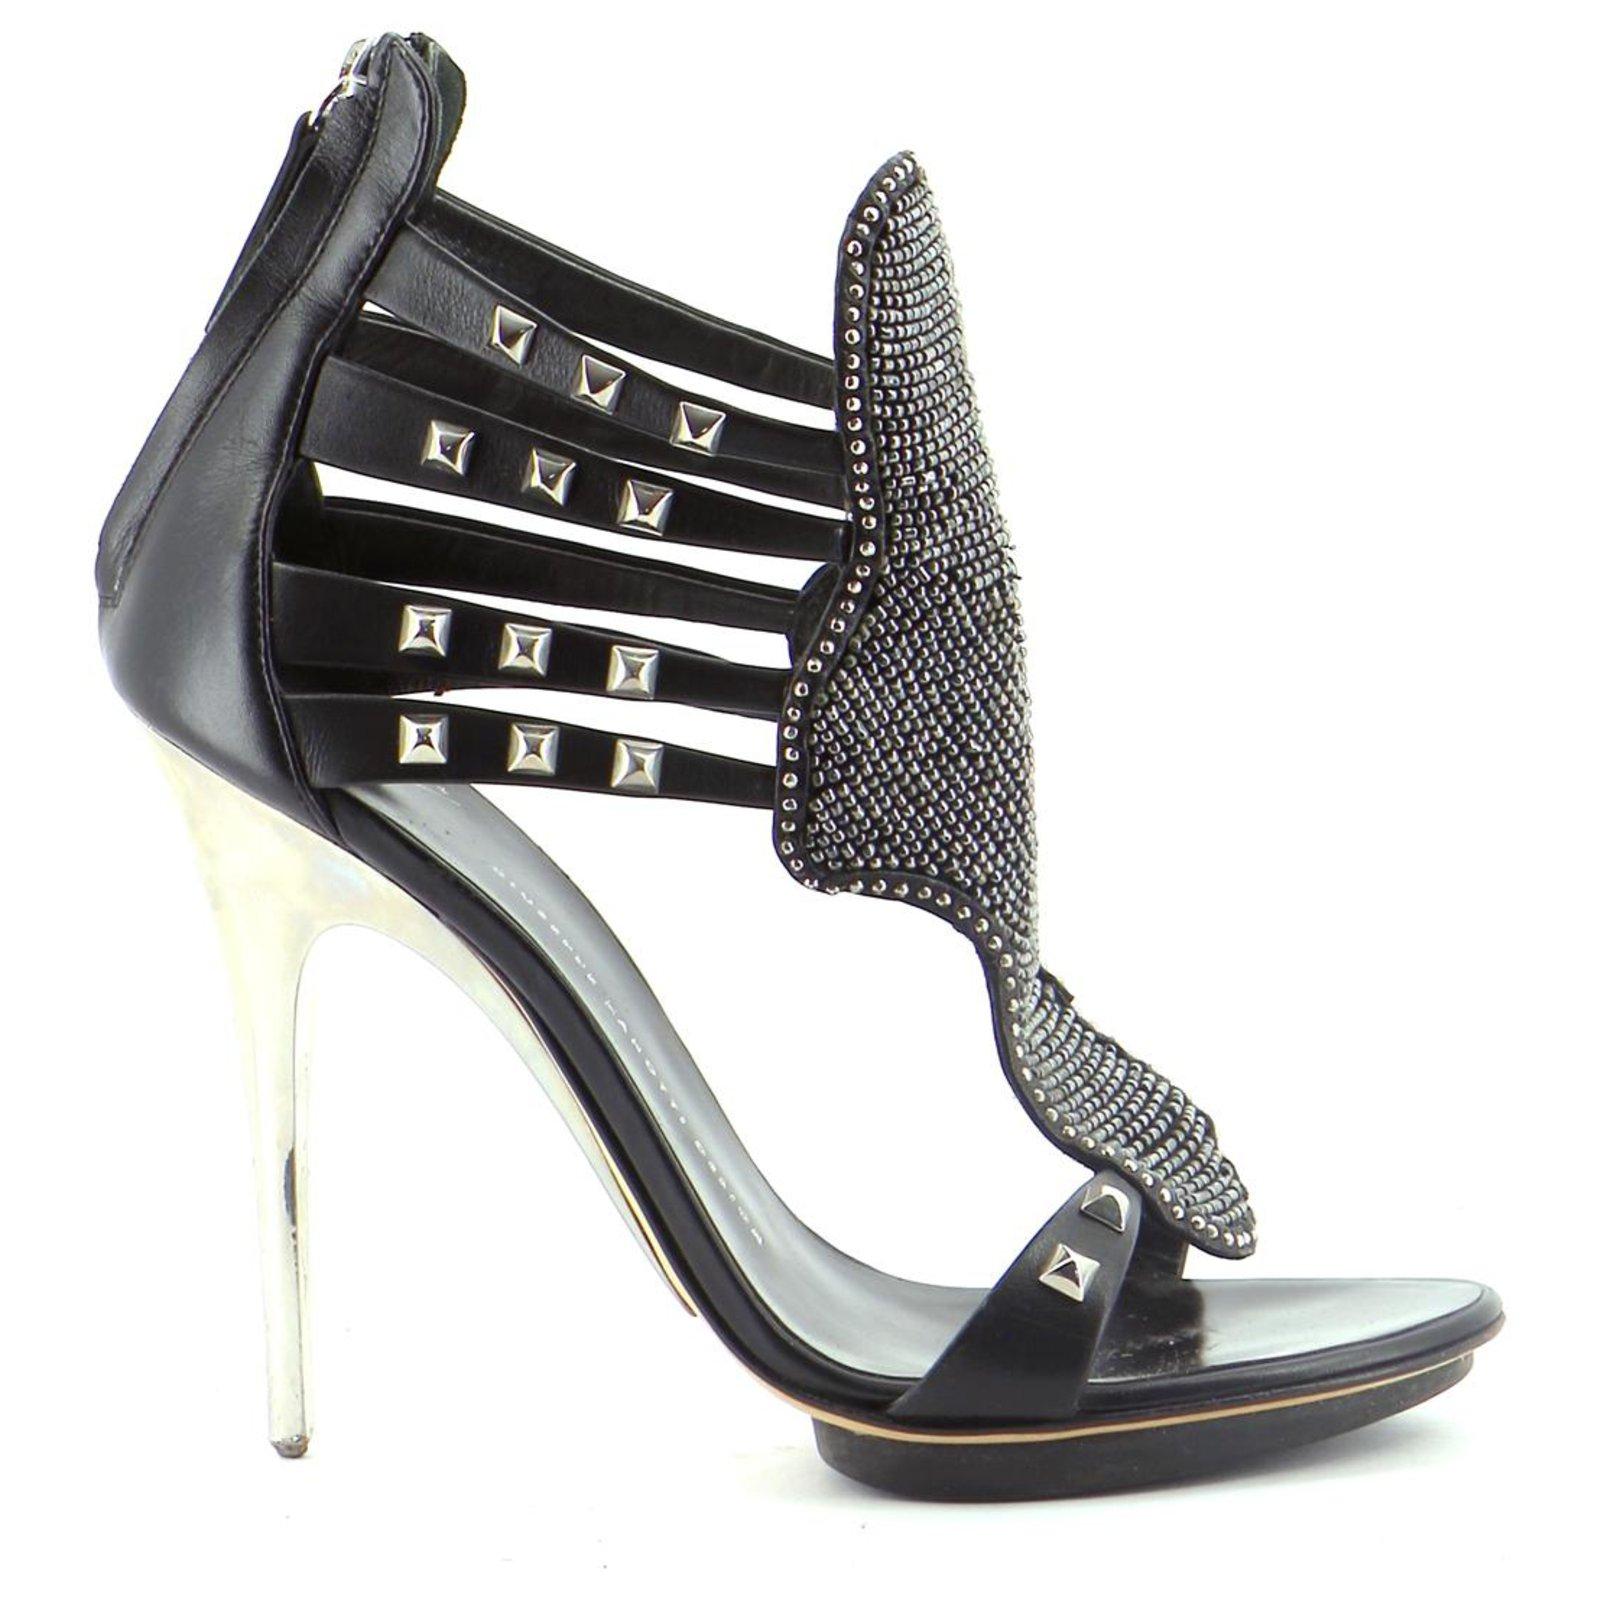 Giuseppe Zanotti Pumps Heels Leather